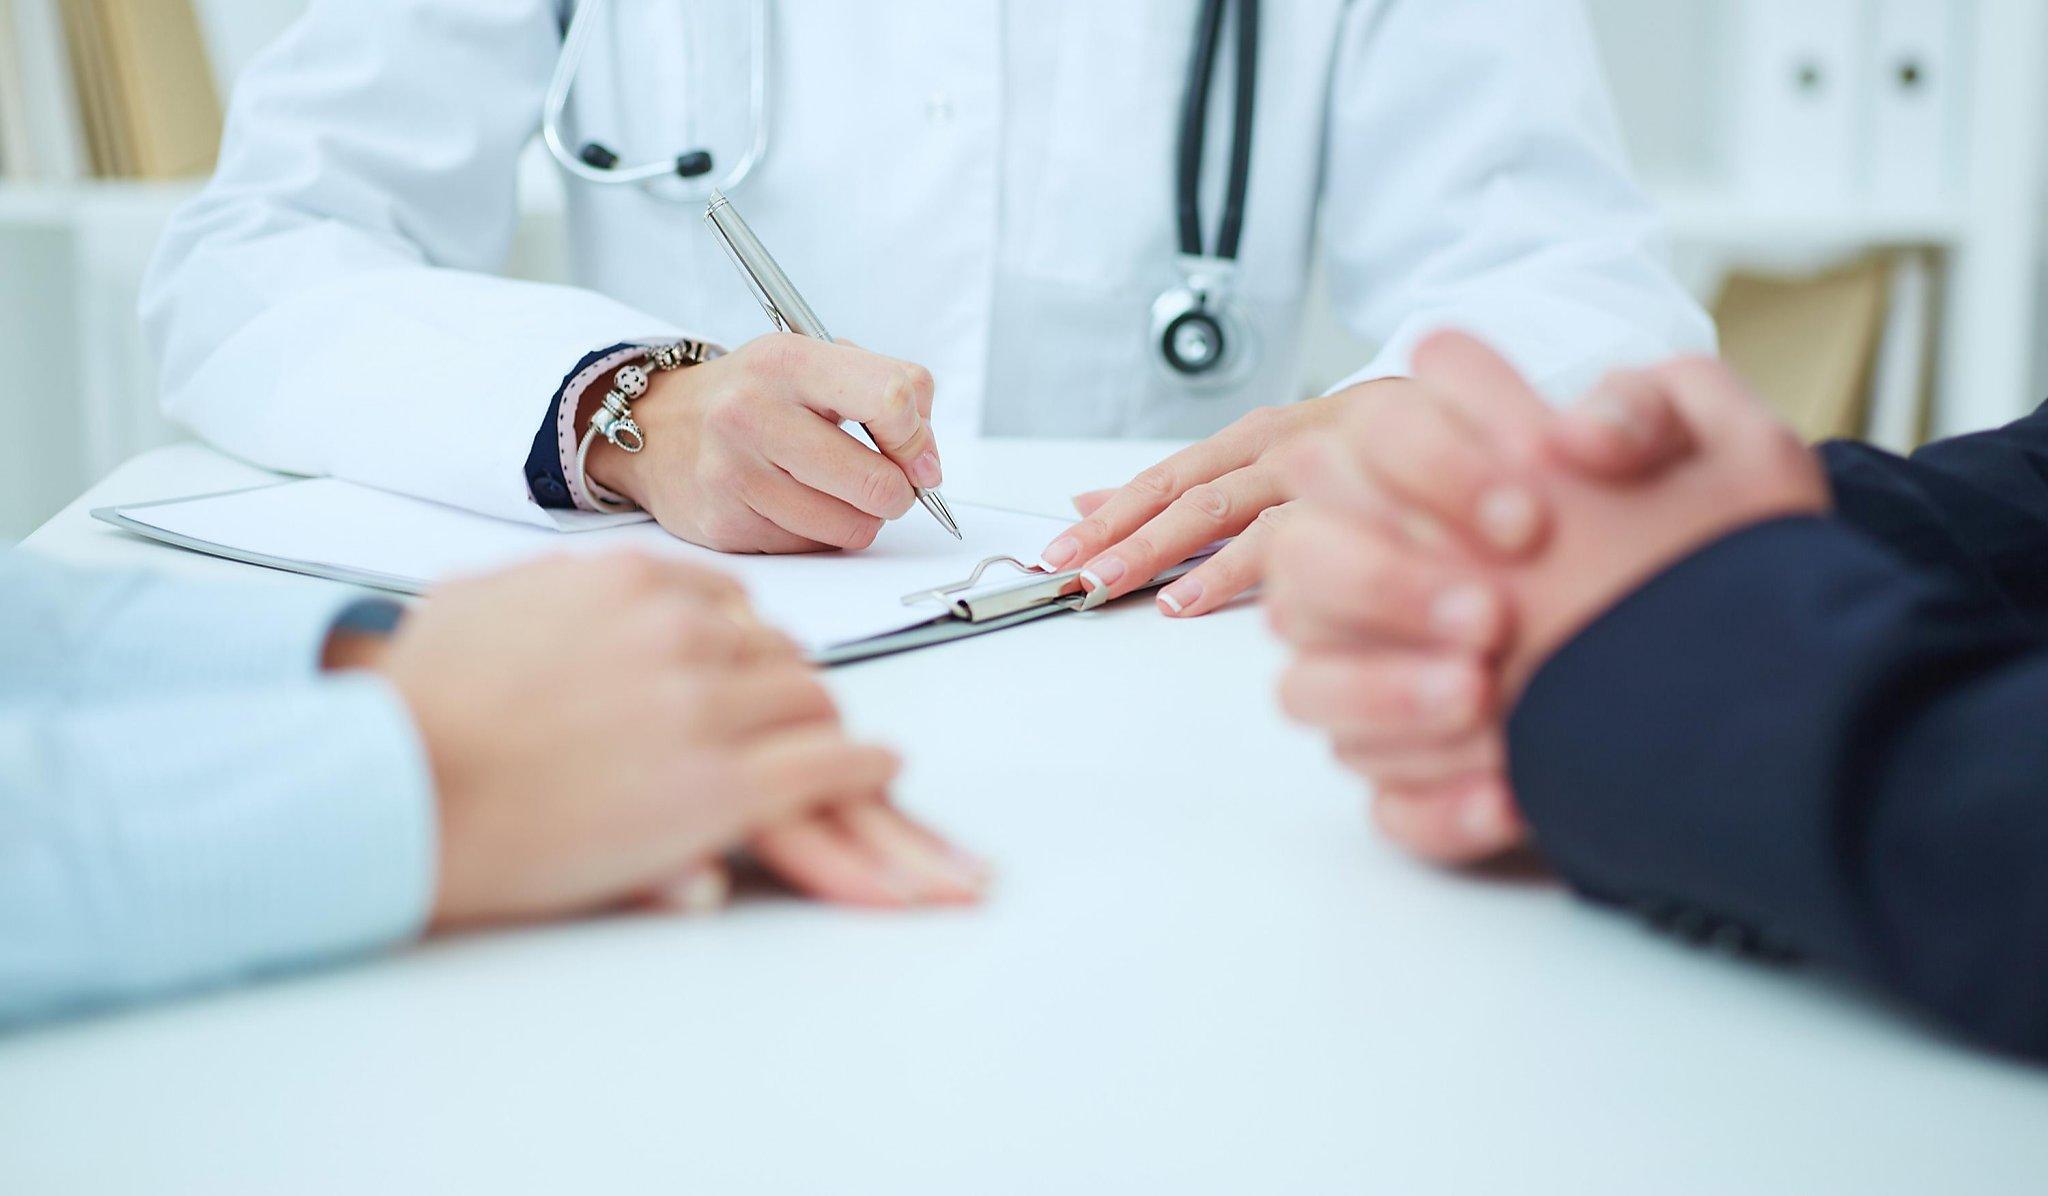 Doctor shortage is California's primary public health